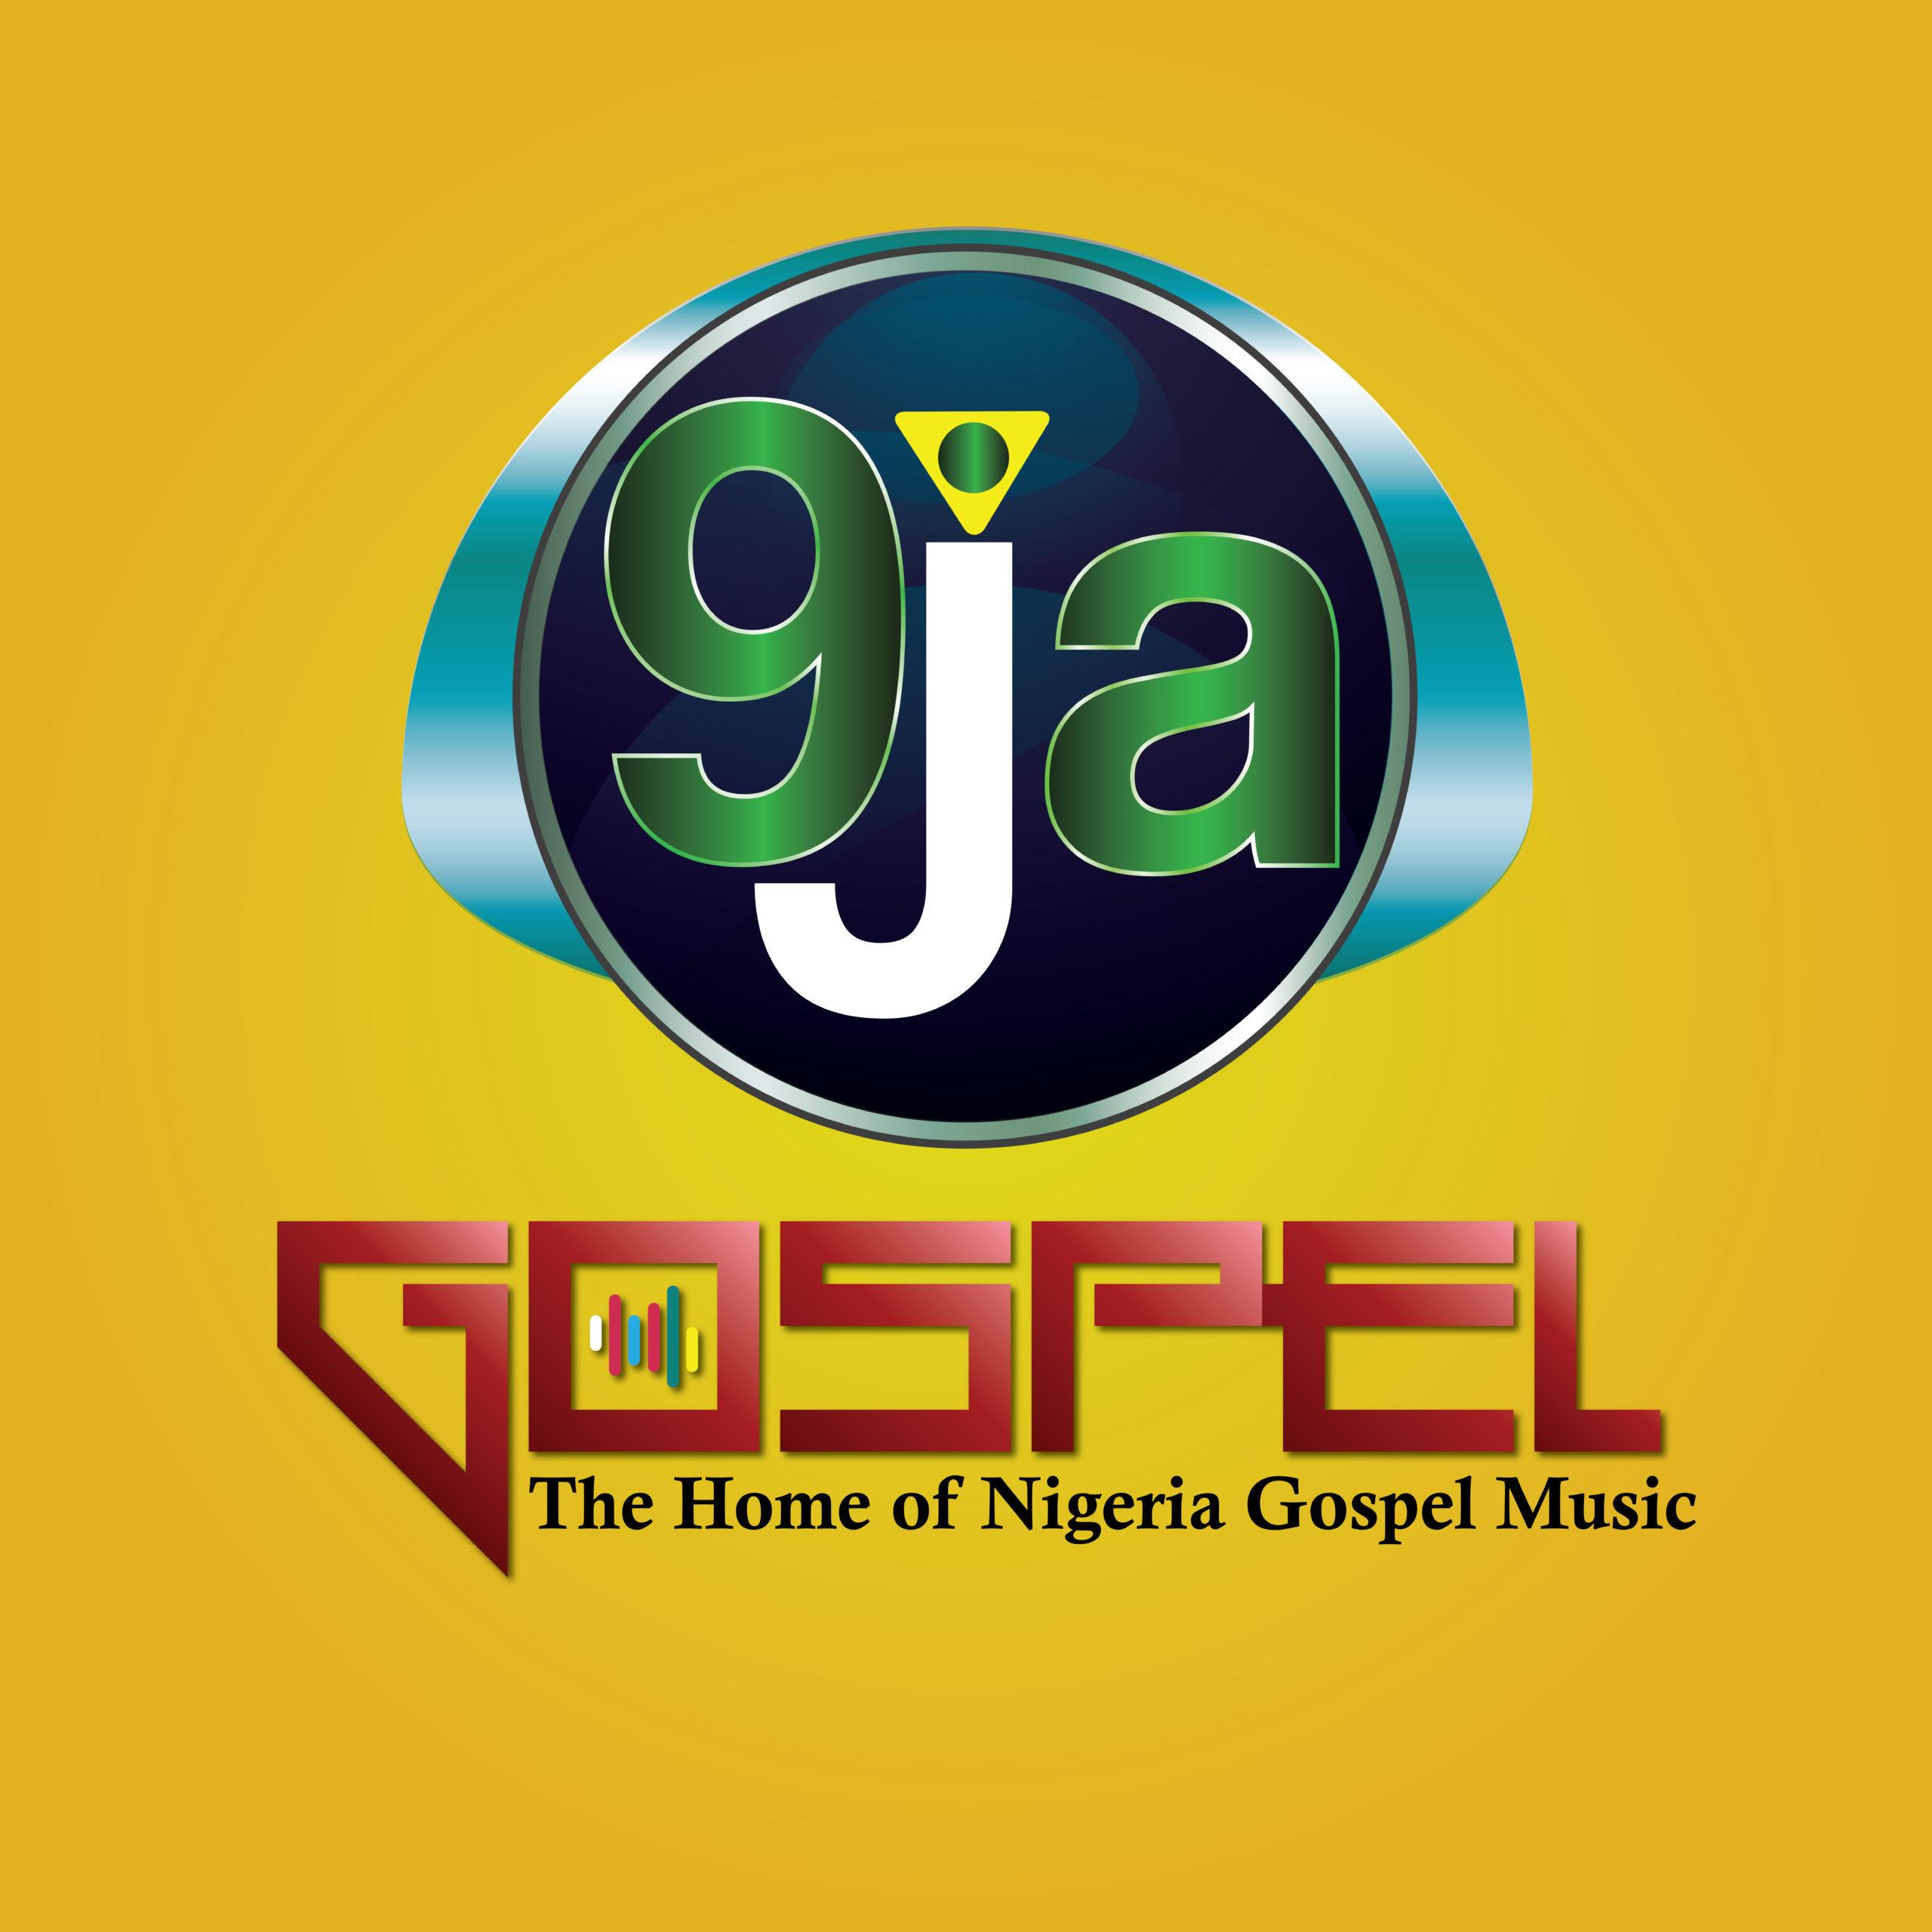 9ja Gospel